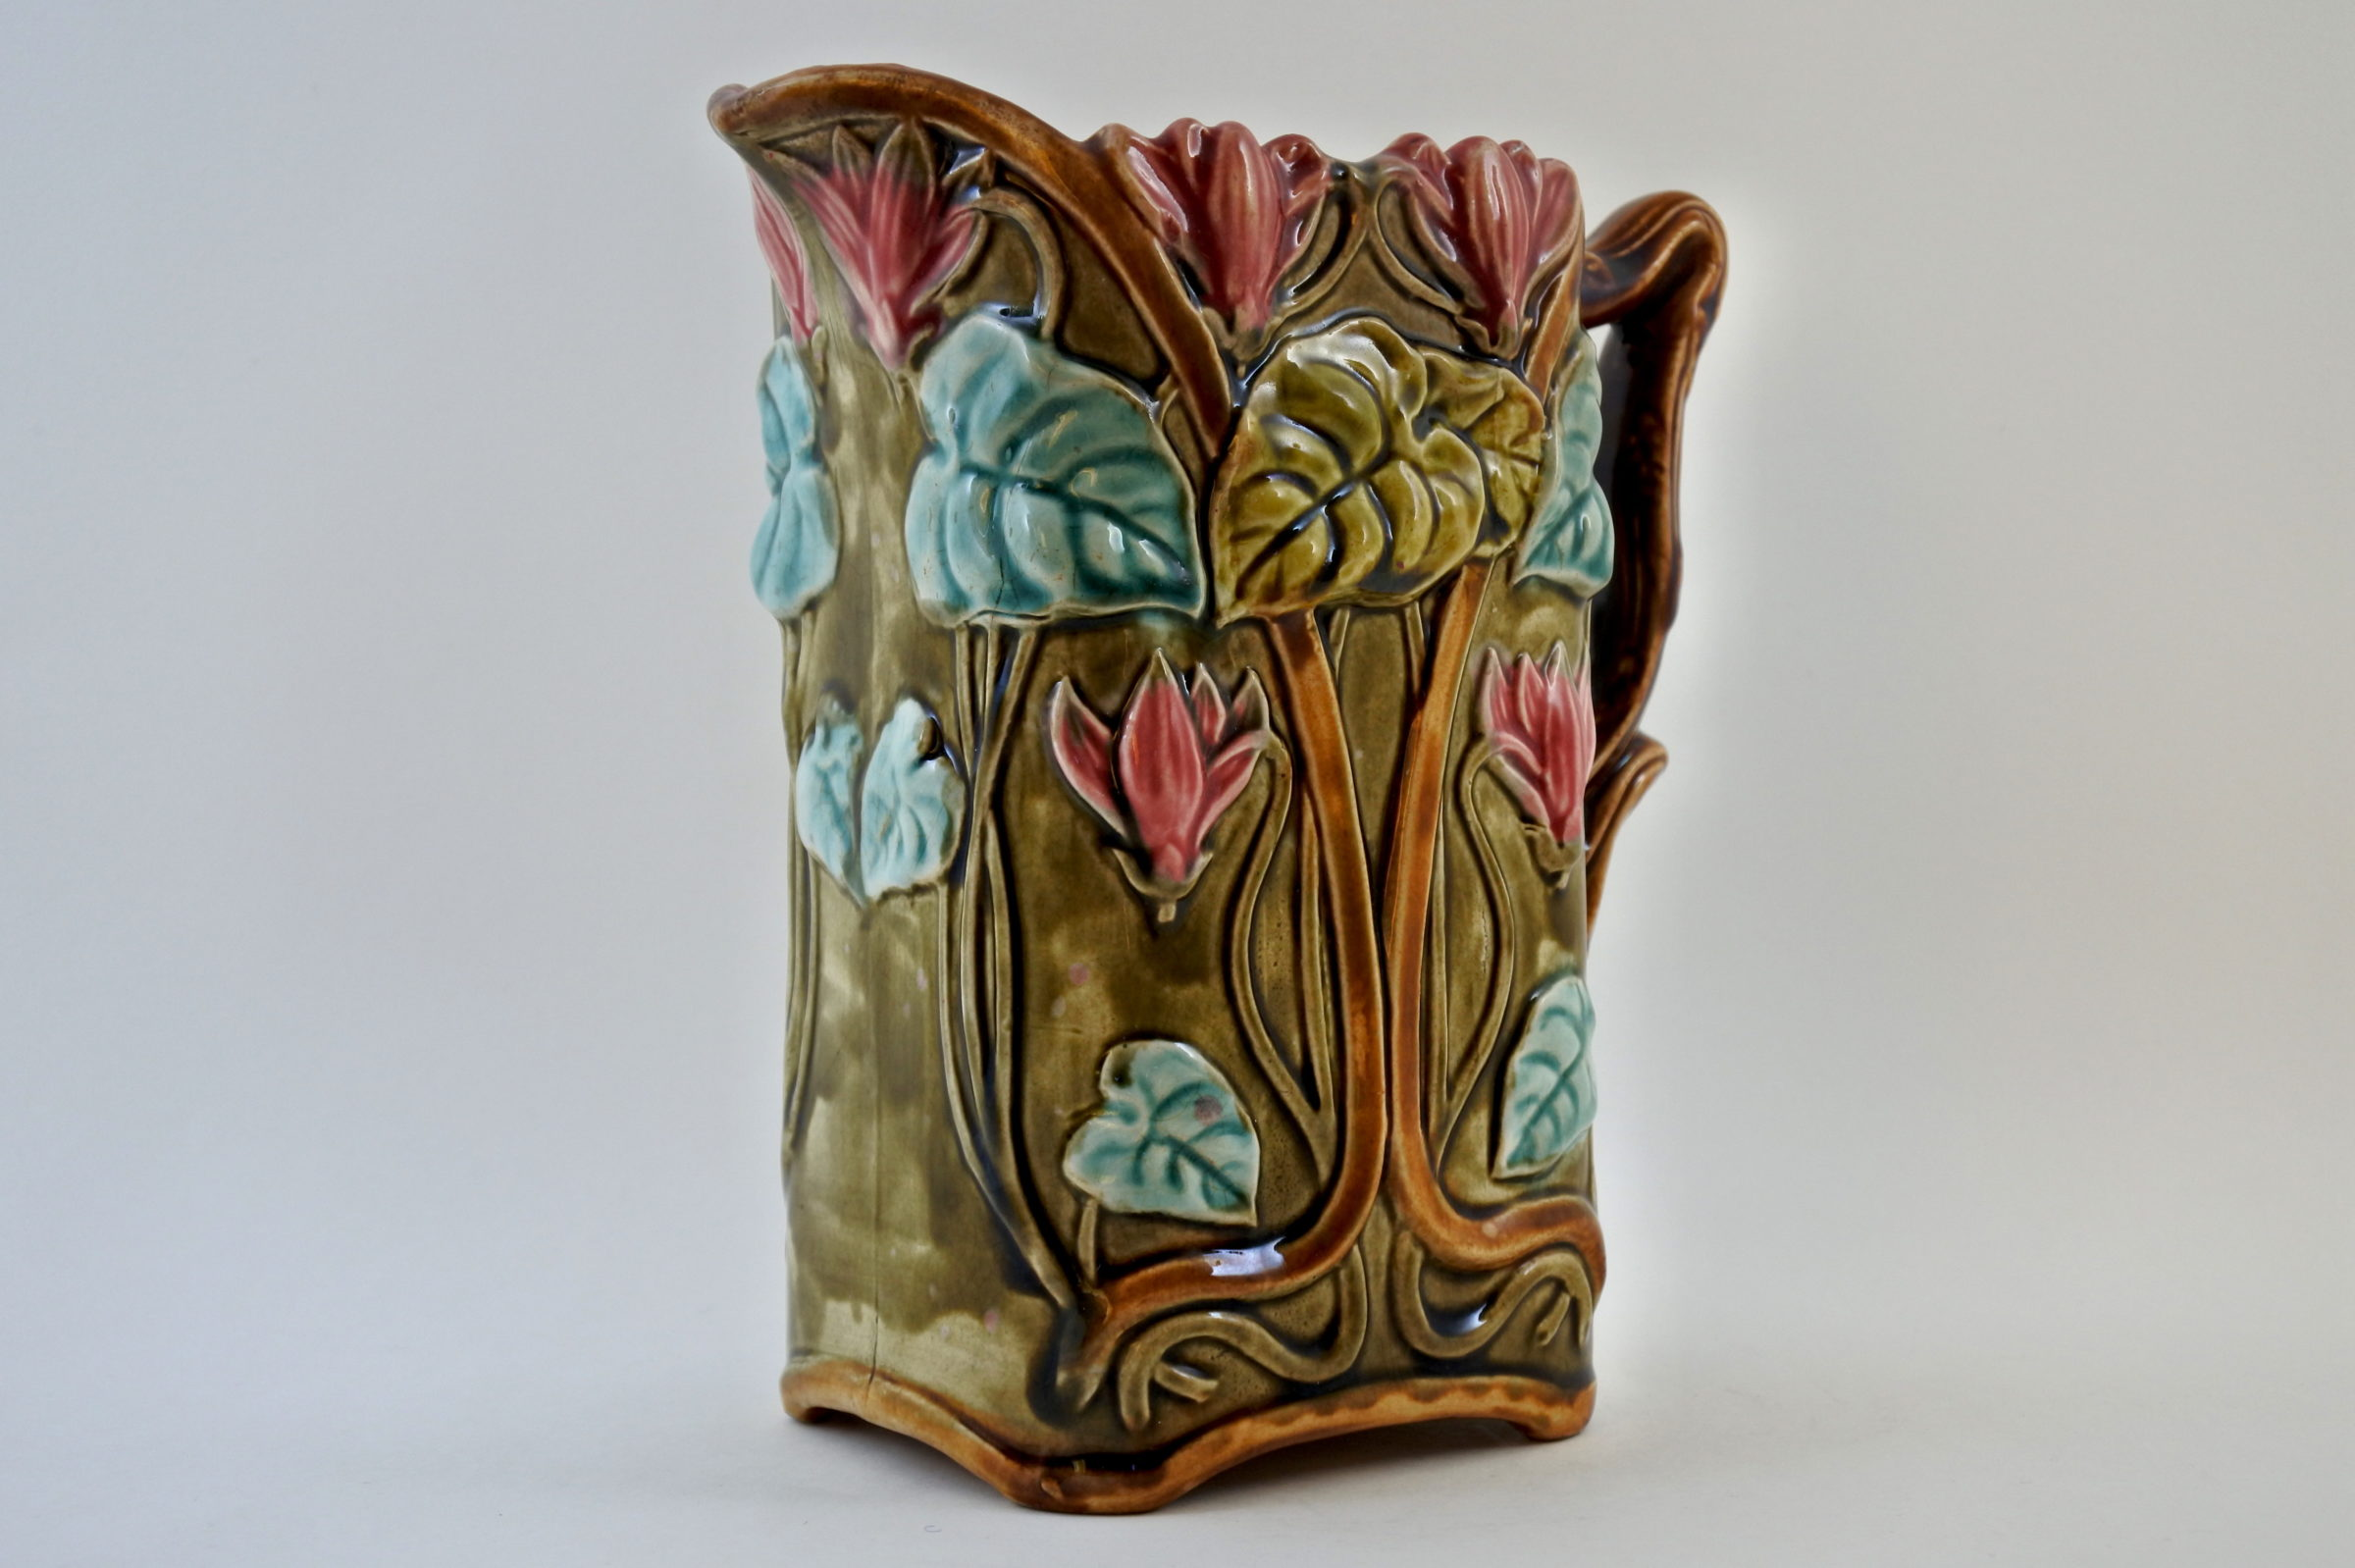 Brocca in ceramica barbotine con ciclamini - Carré cyclamen